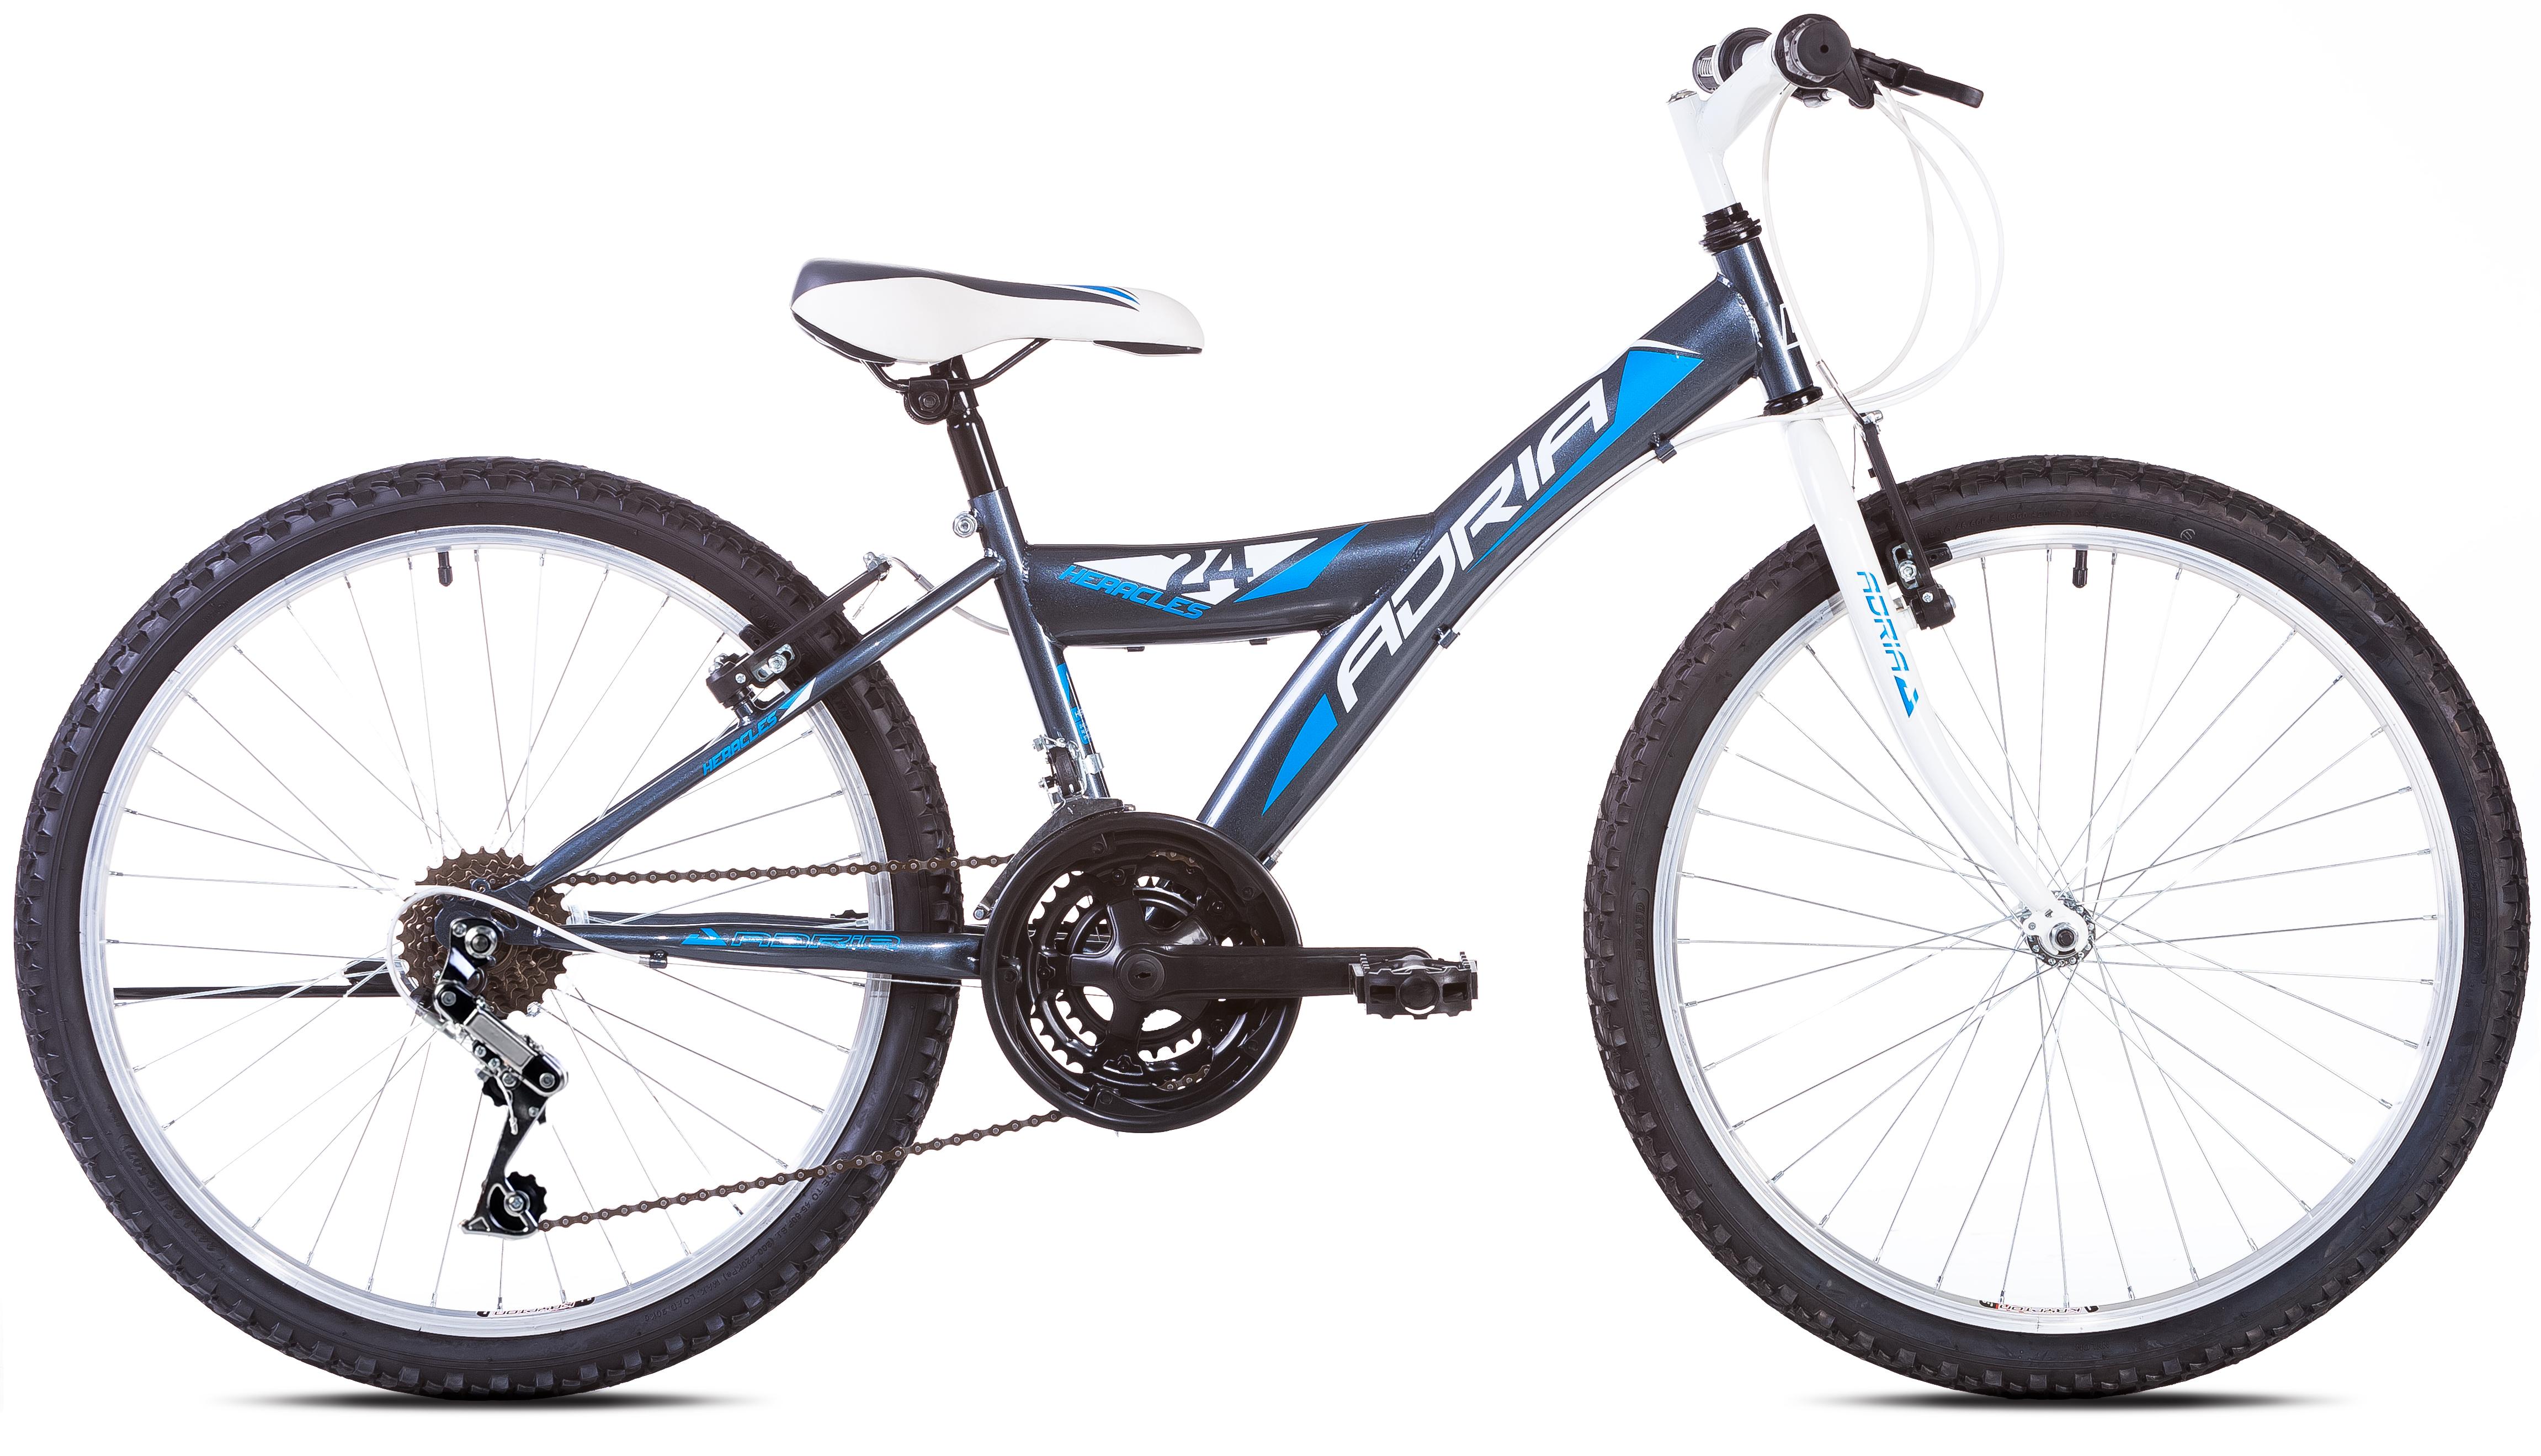 bicikl-adria-heracles-240-sivo-plava